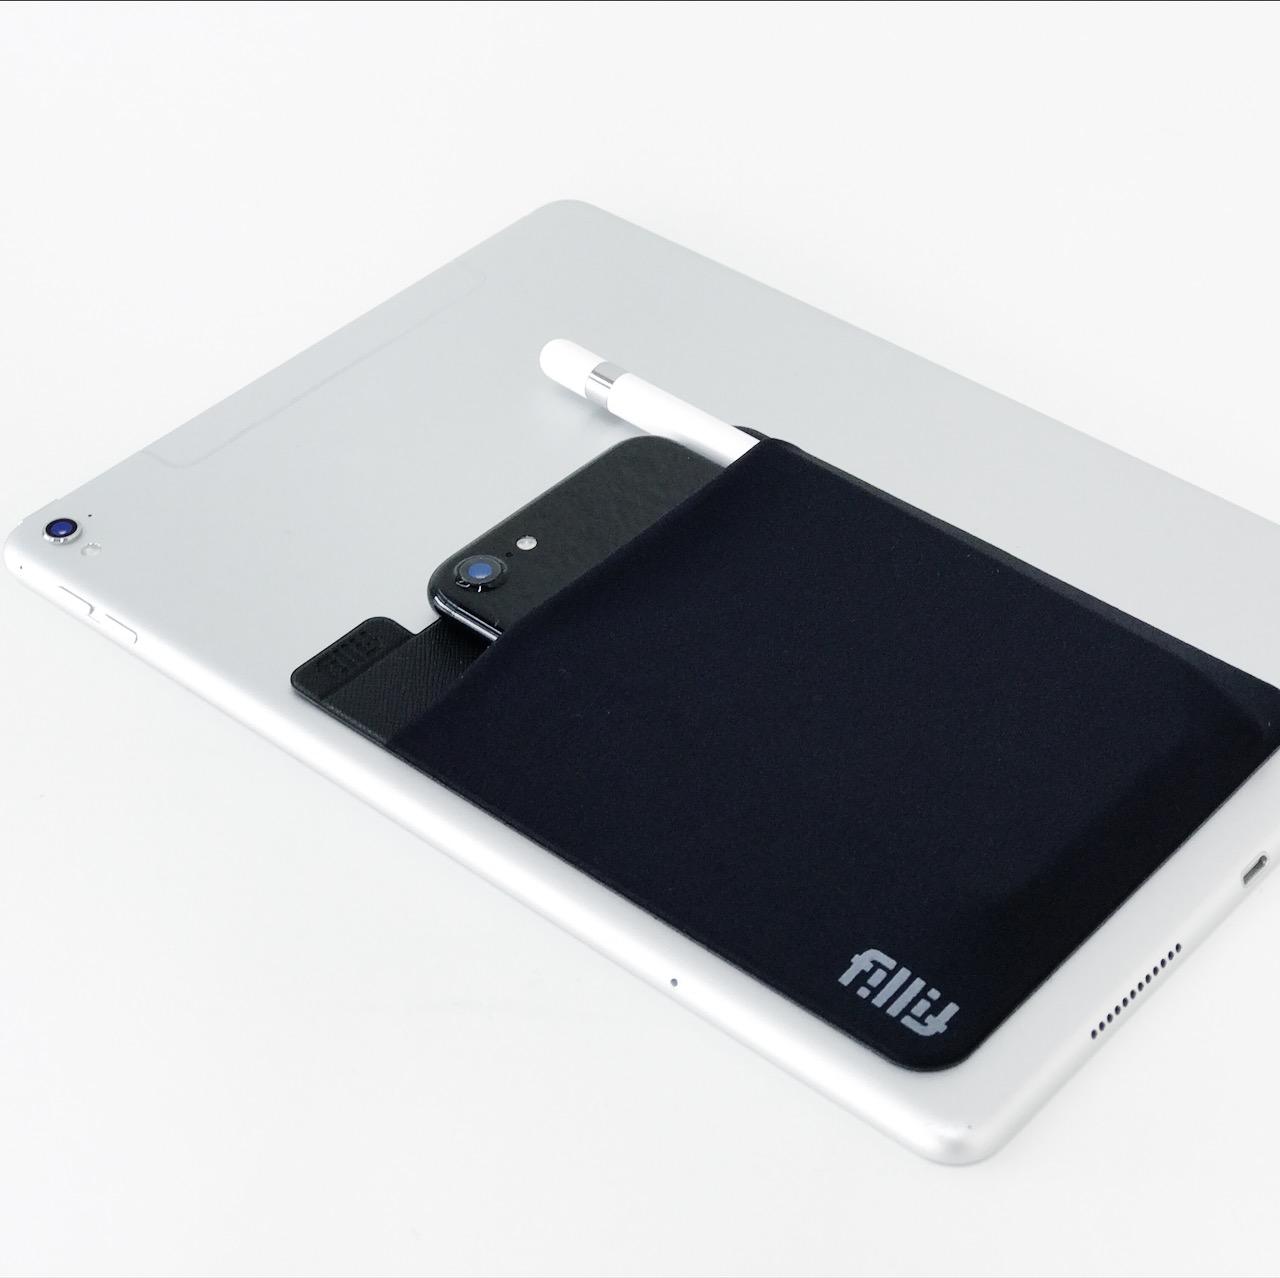 Fillit Pocket x1 Main-3.JPG